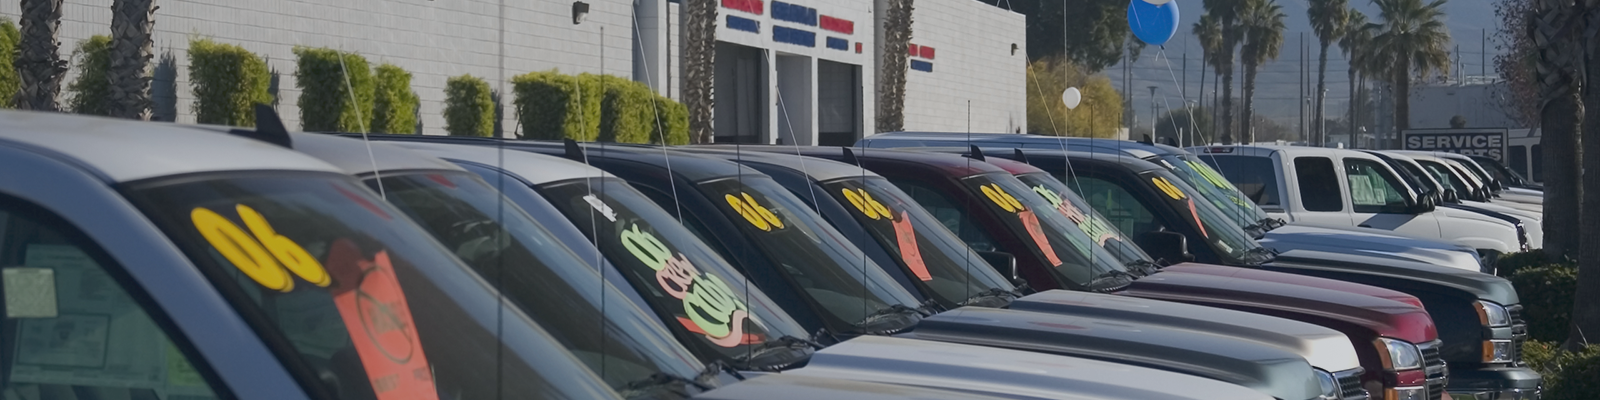 Used Car Dealers Using GPS Vehicle Tracking